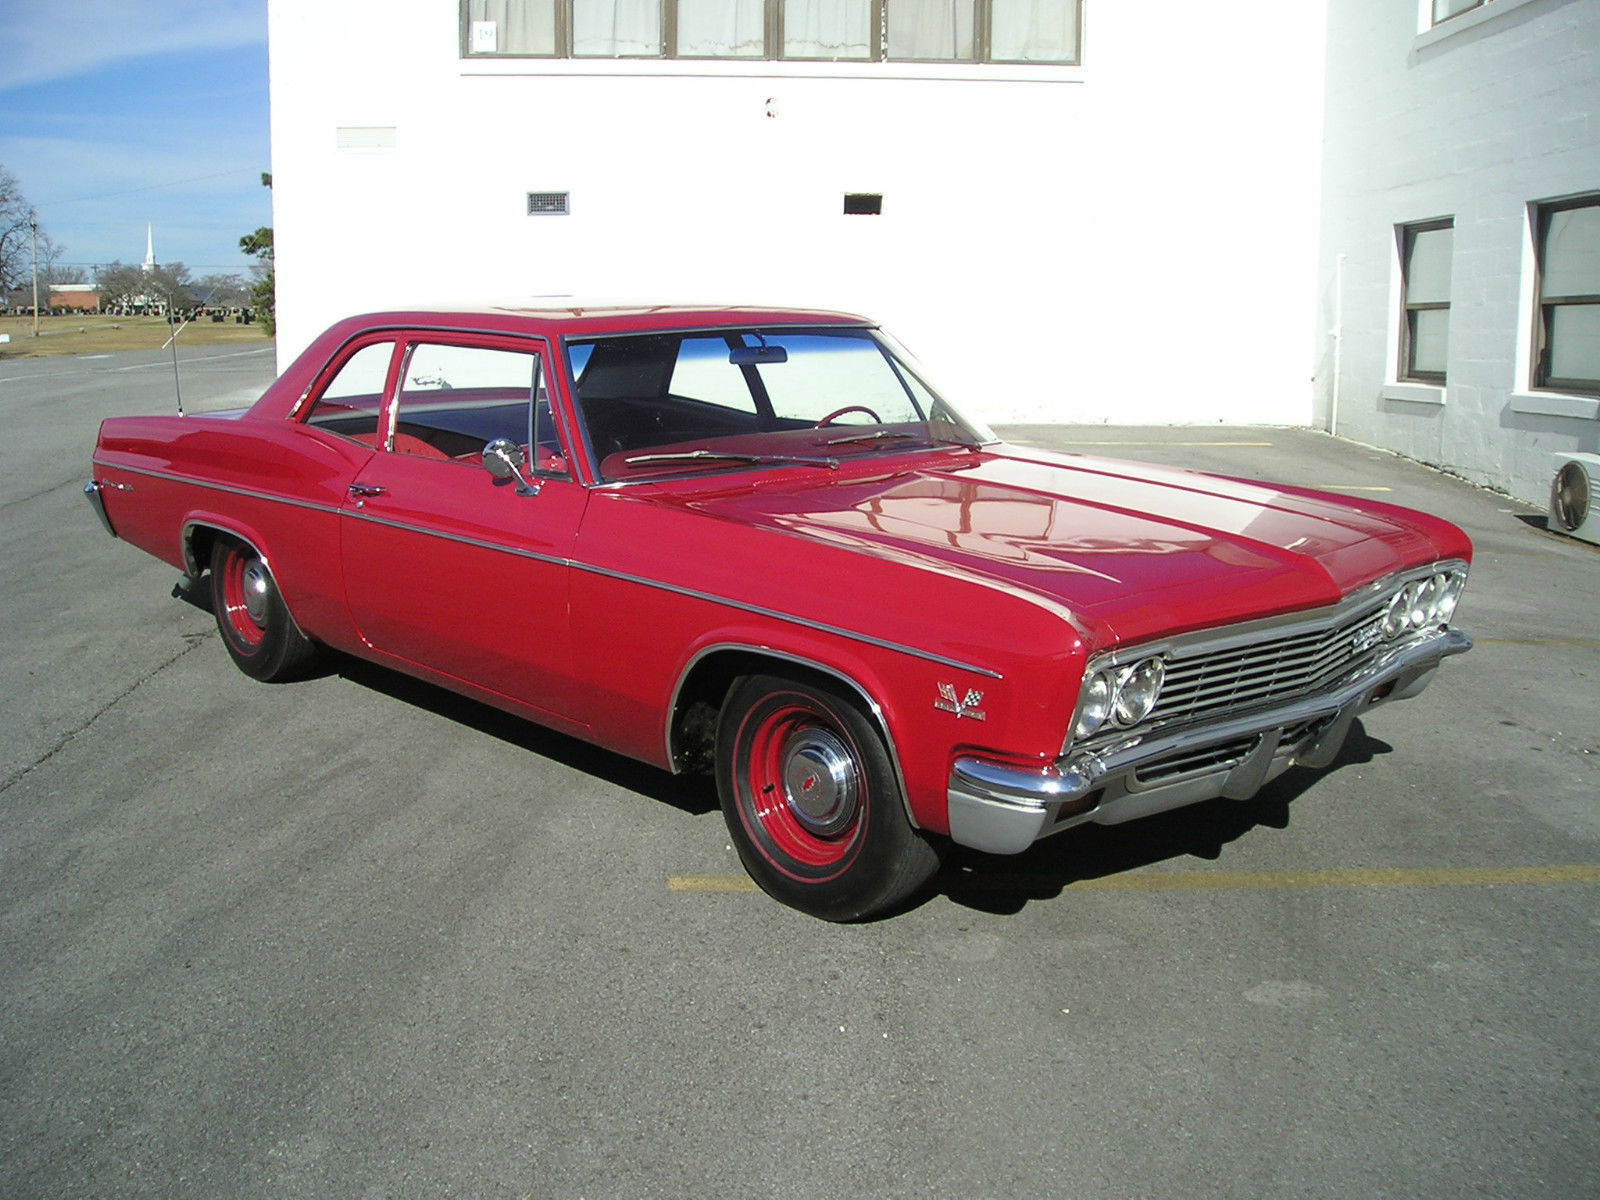 427 425hp Matching Engine Biscaynesuper Sport Impalacaprice 1966 Chevrolet Bel Air Impala 150 210 L 72